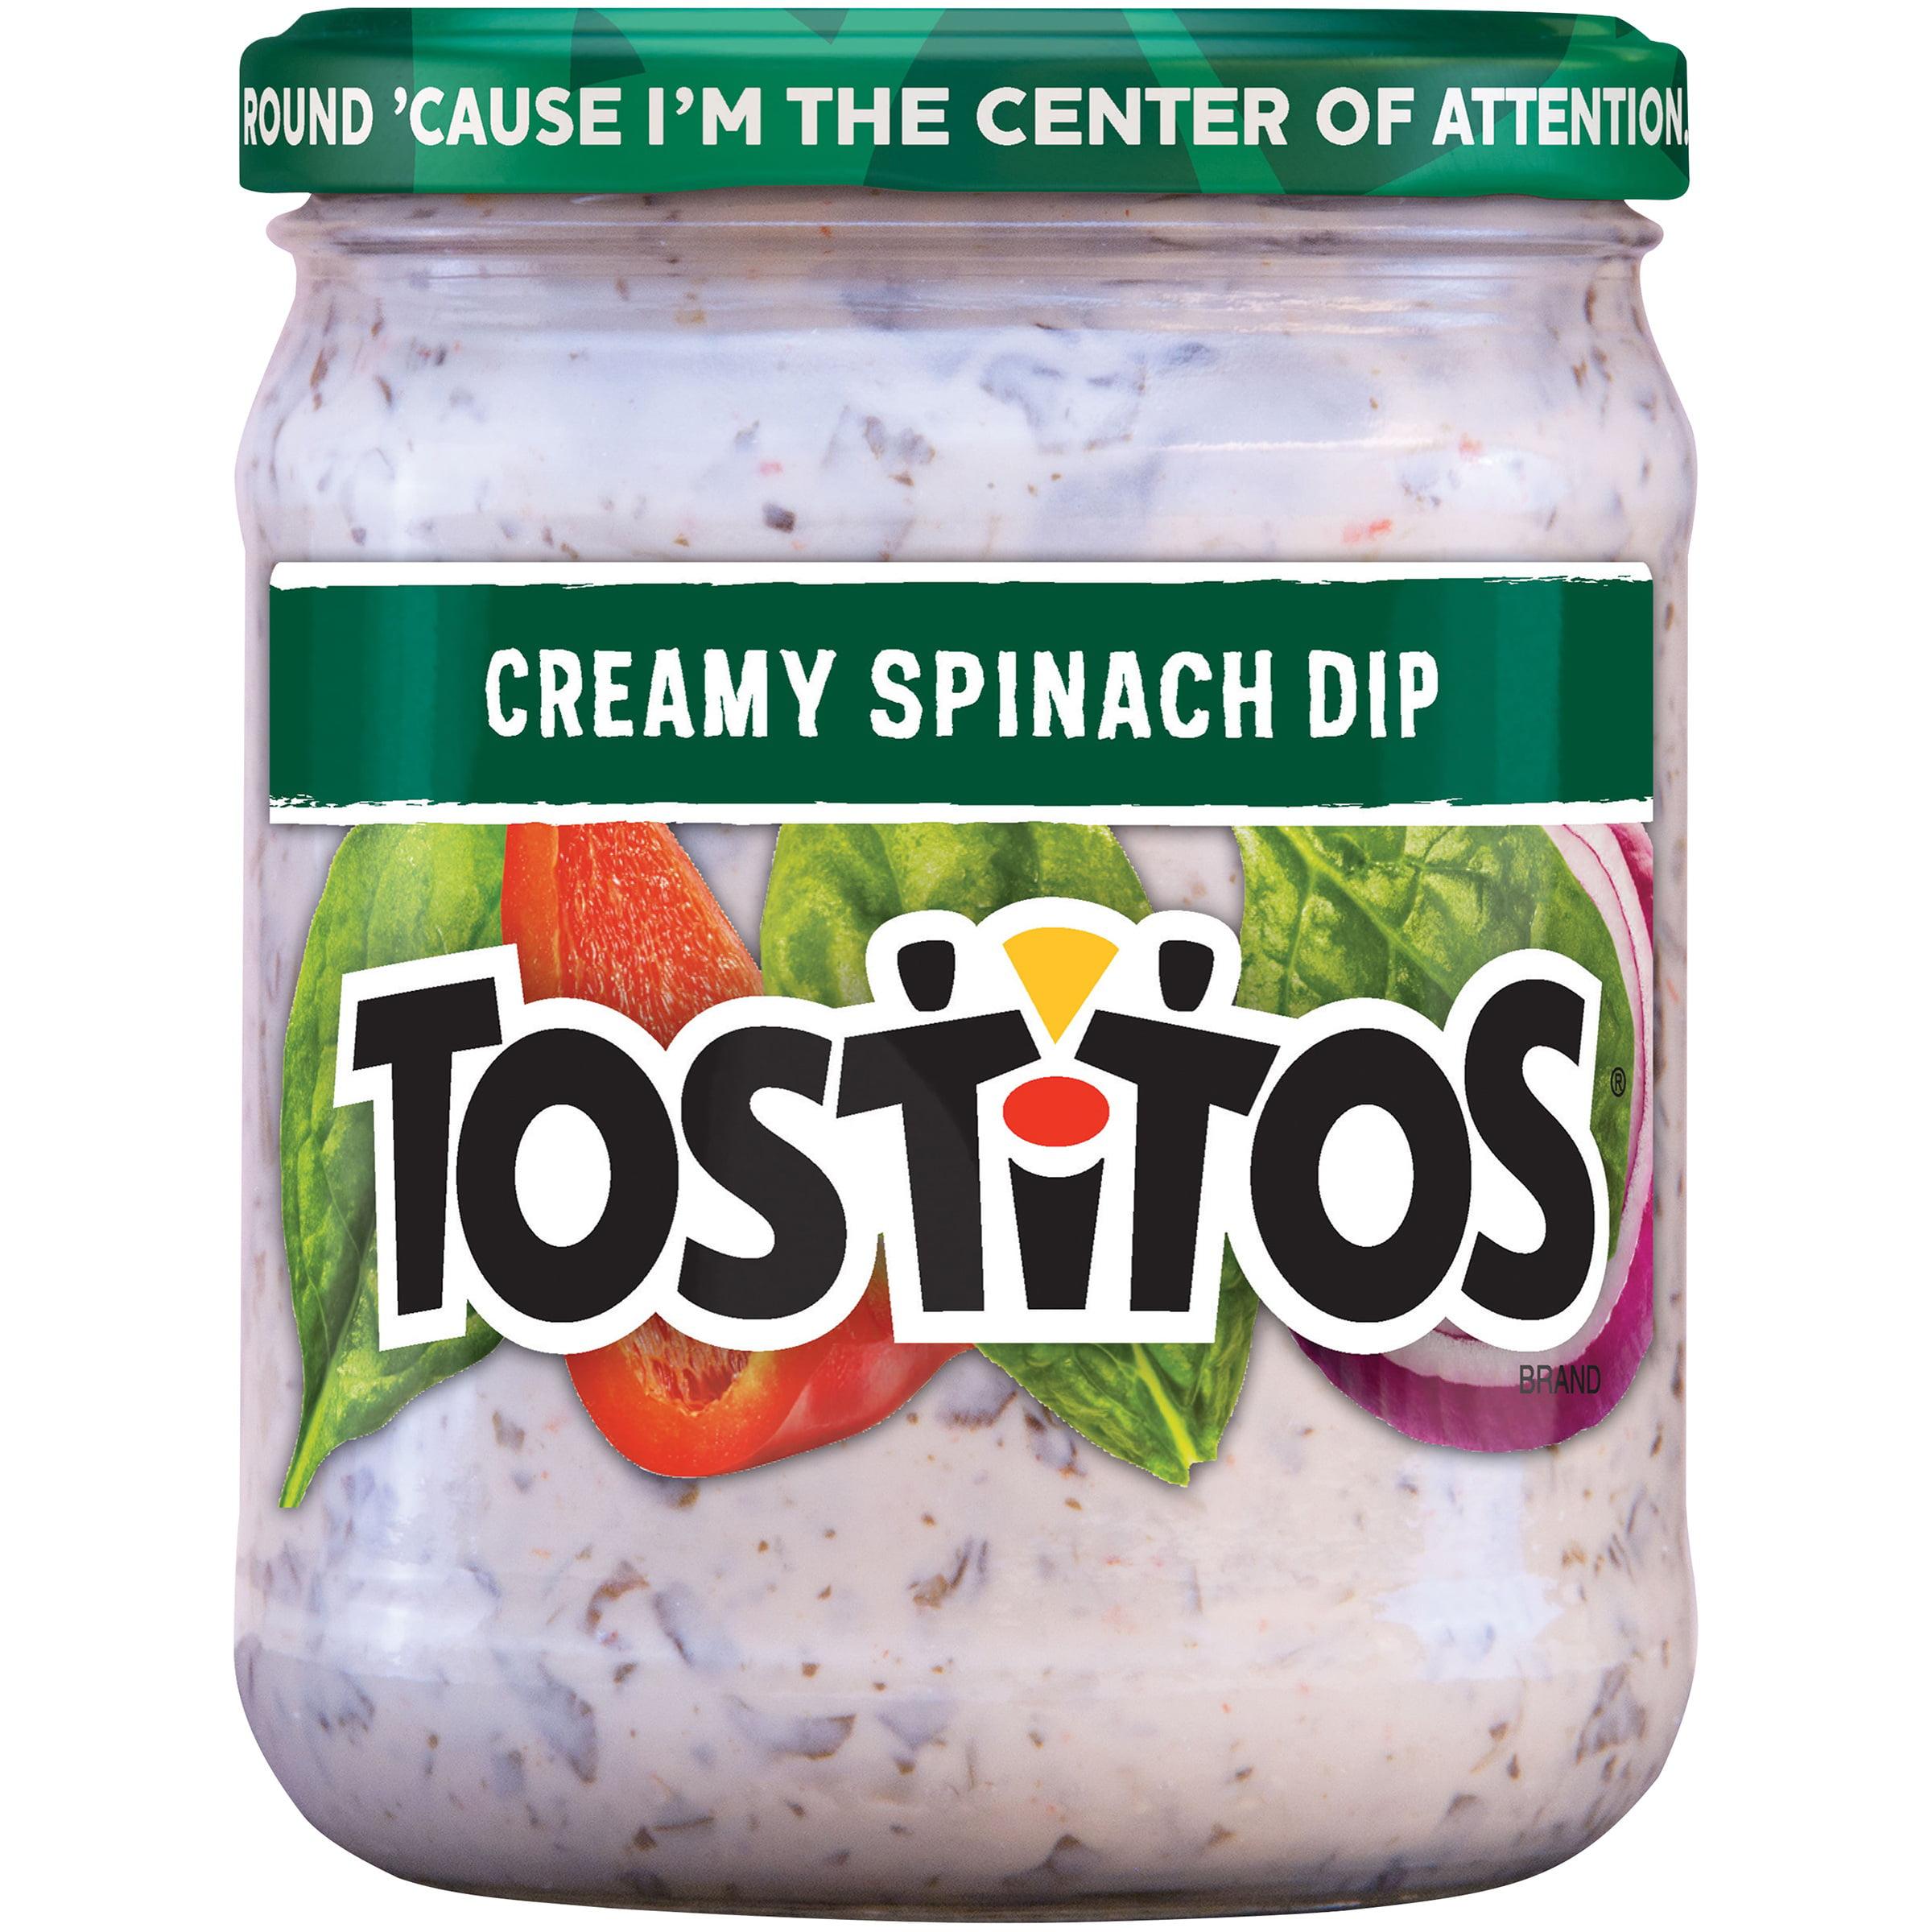 (2 Pack) Tostitos Creamy Spinach Dip, 15 Oz